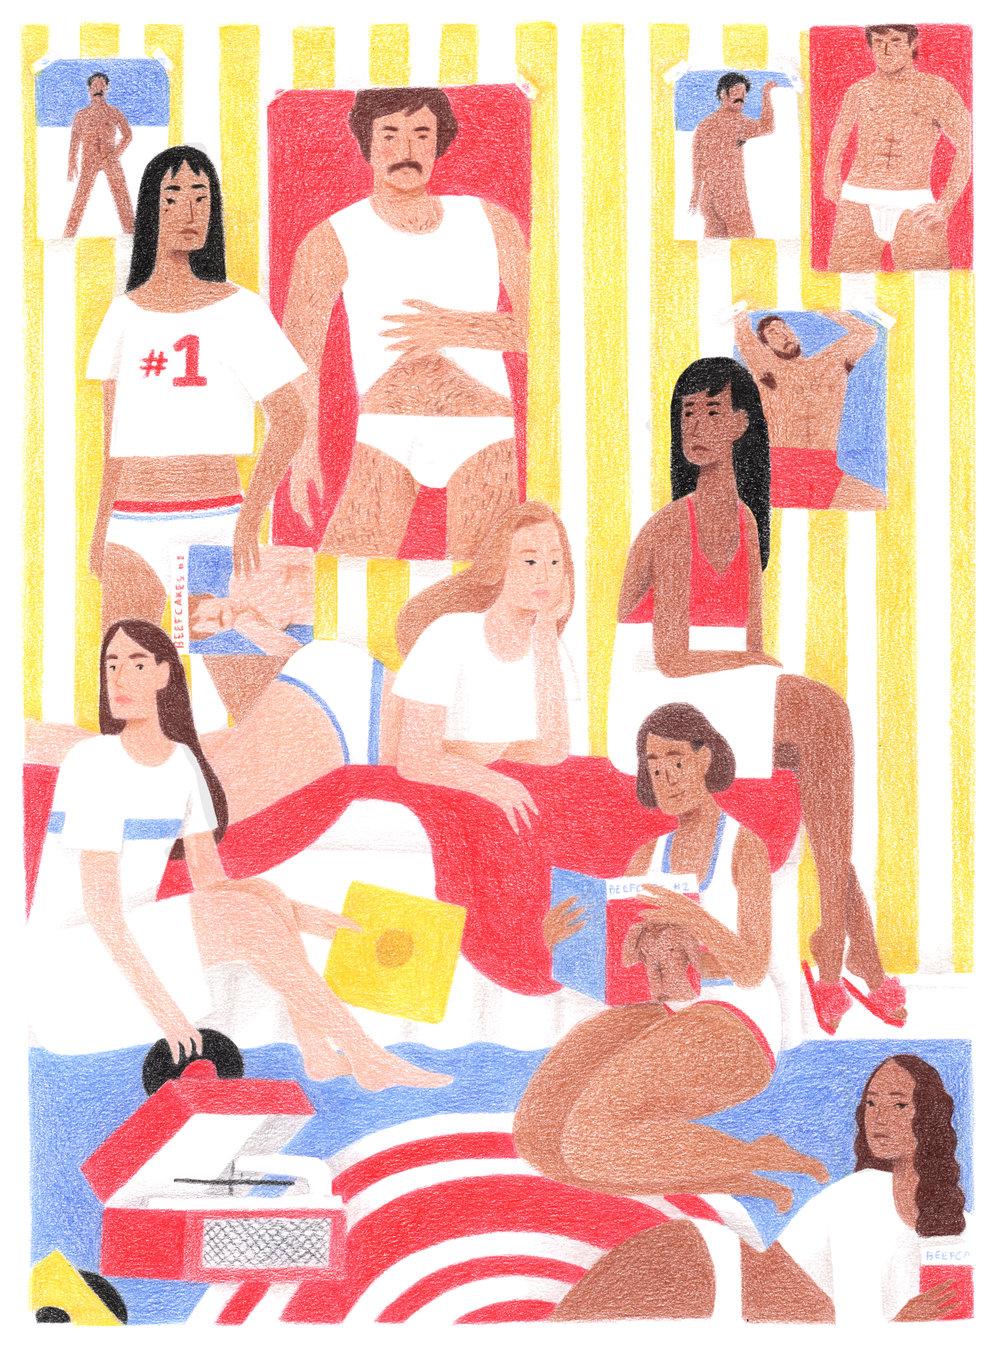 Girls - Sassify Zine Volume 4, 2017